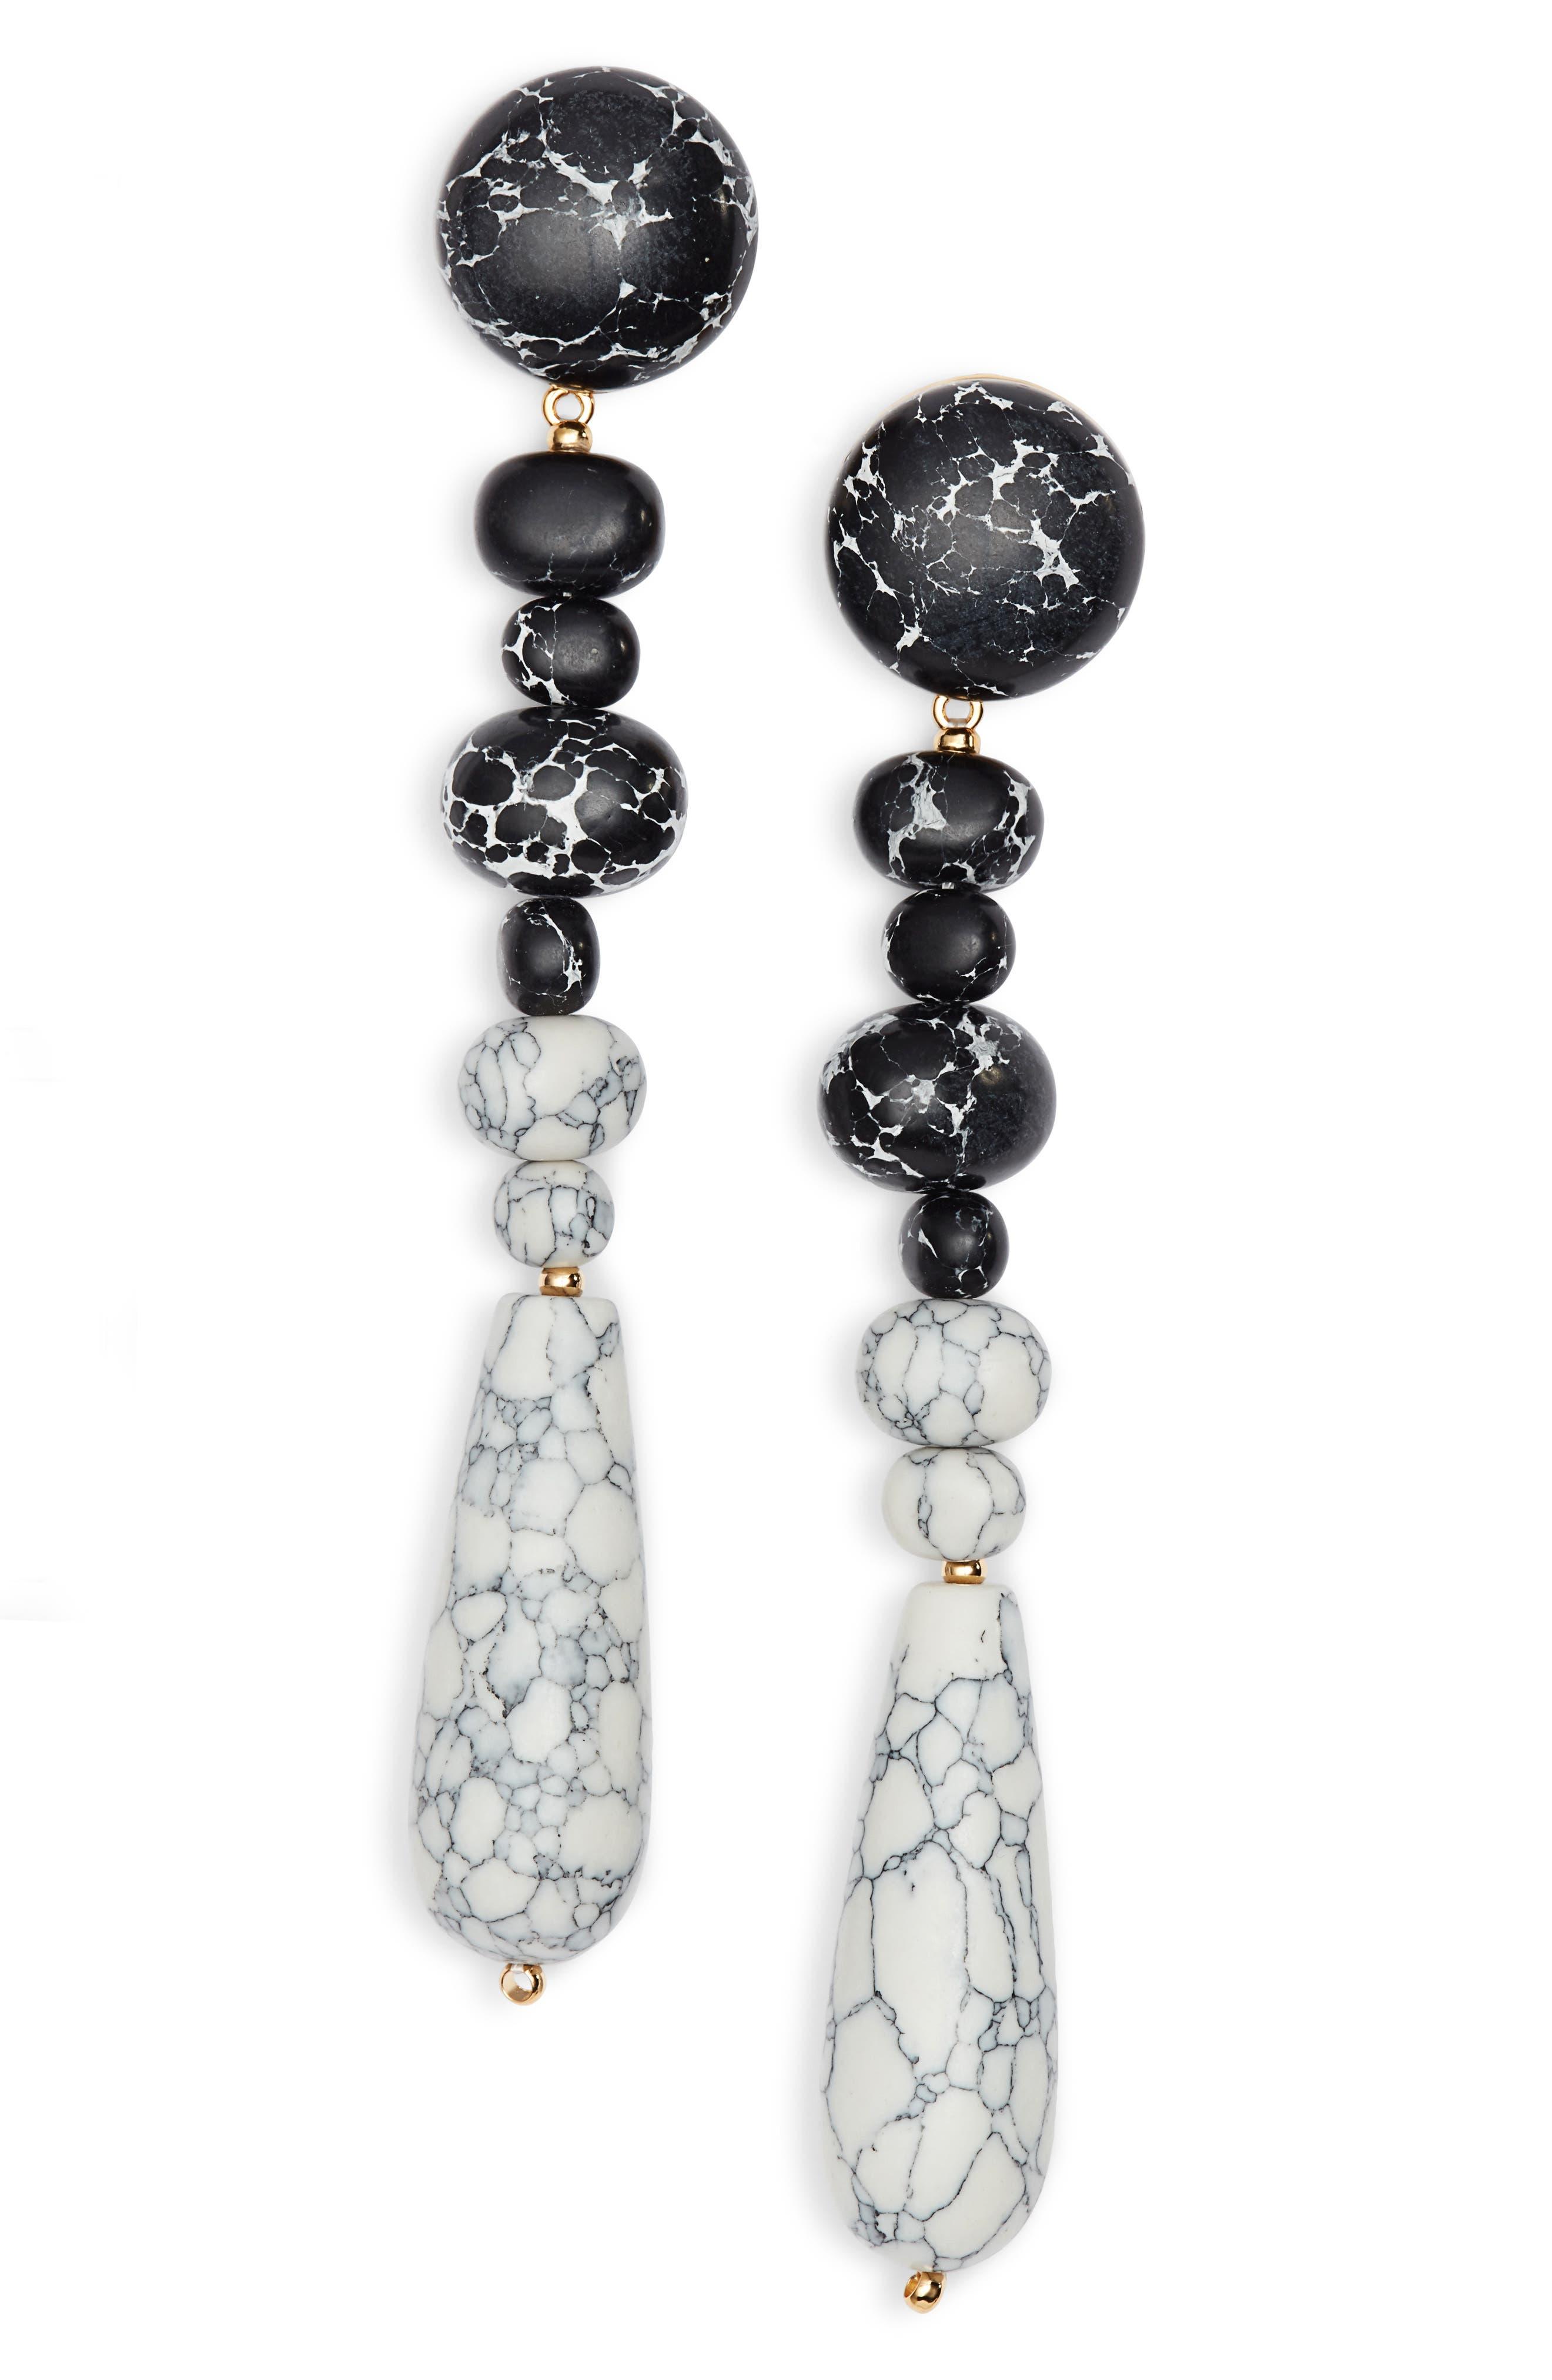 Copacabana Drop Earrings,                         Main,                         color, Black And White